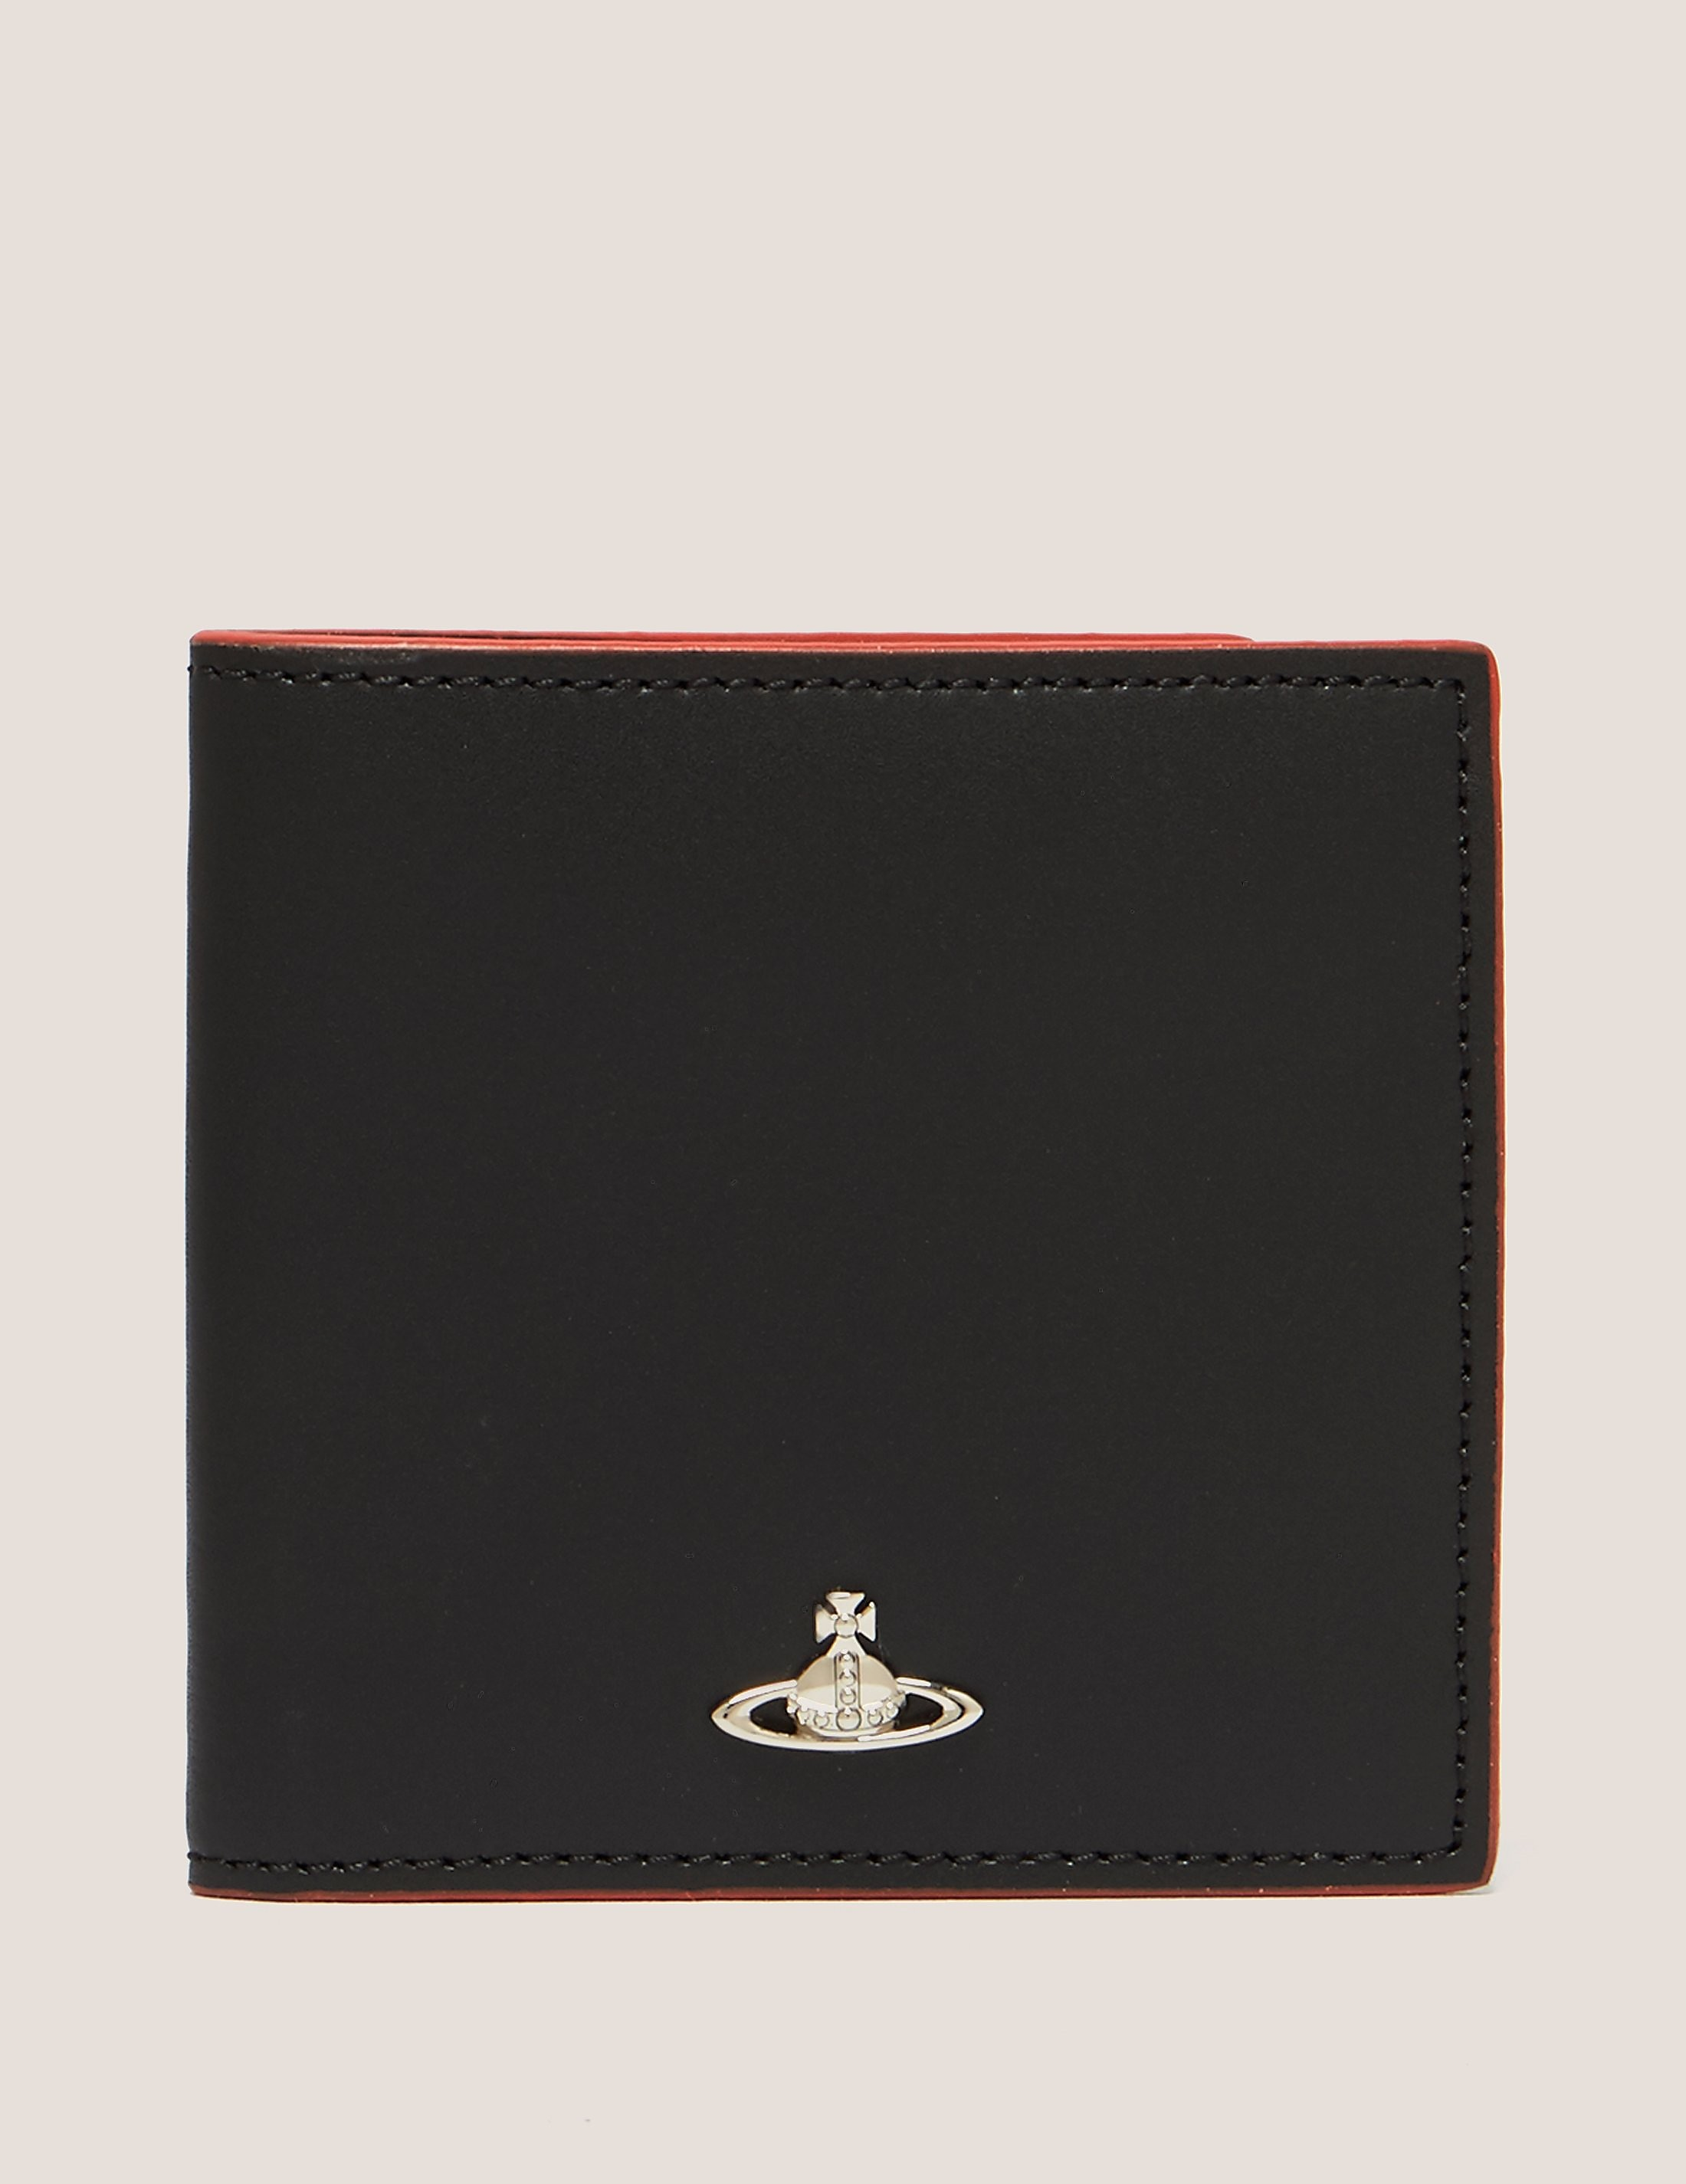 Vivienne Westwood Horizontal Card Holder